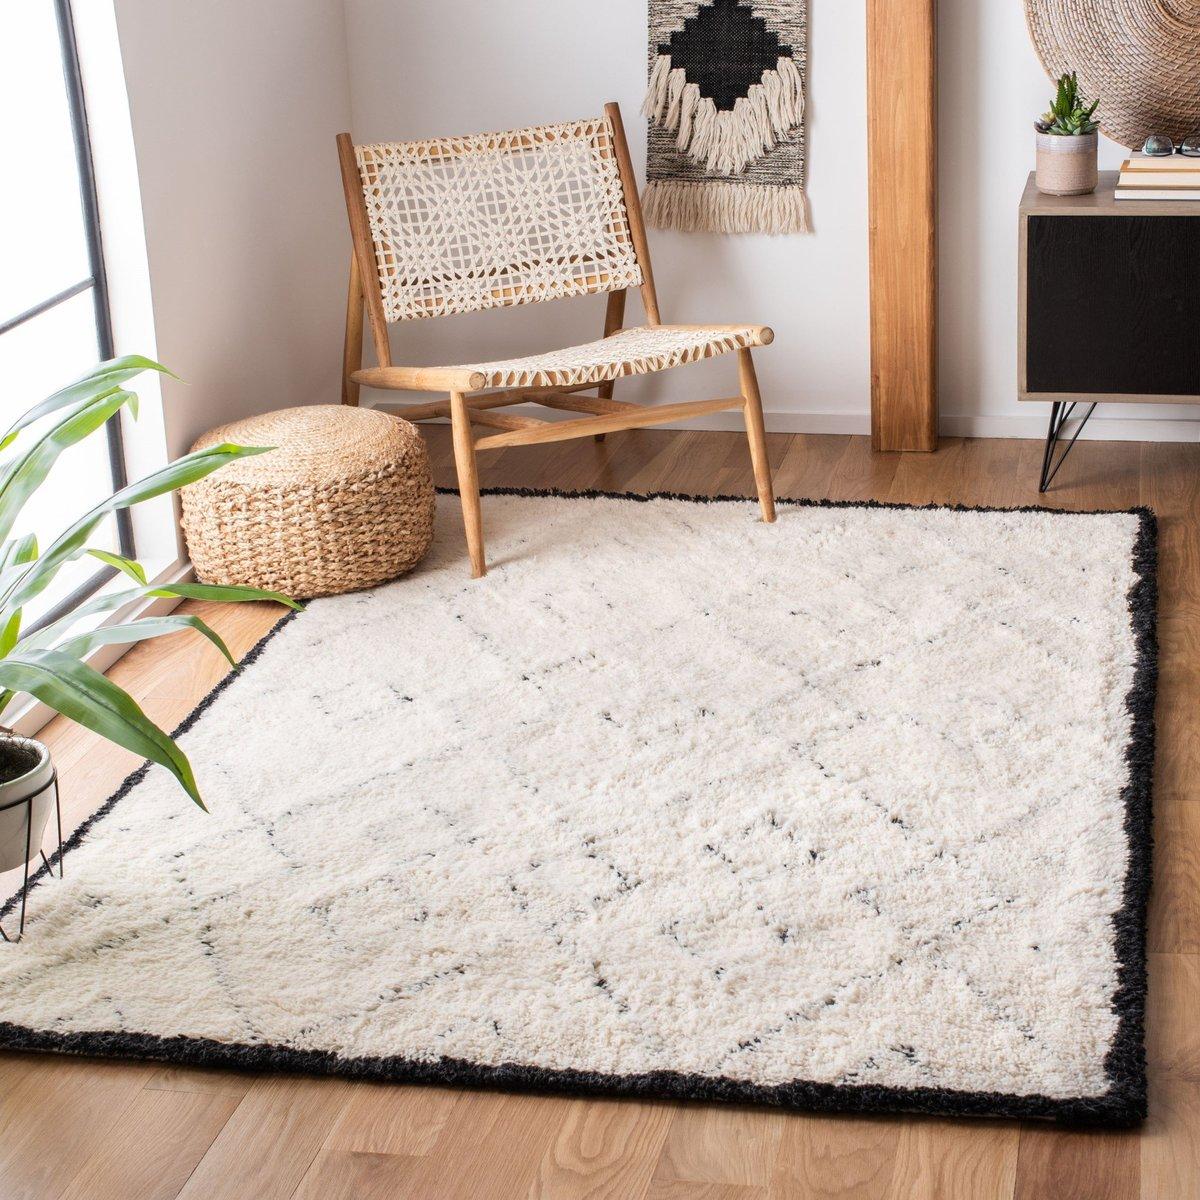 Cozy Corner Living Room Decor Ideas